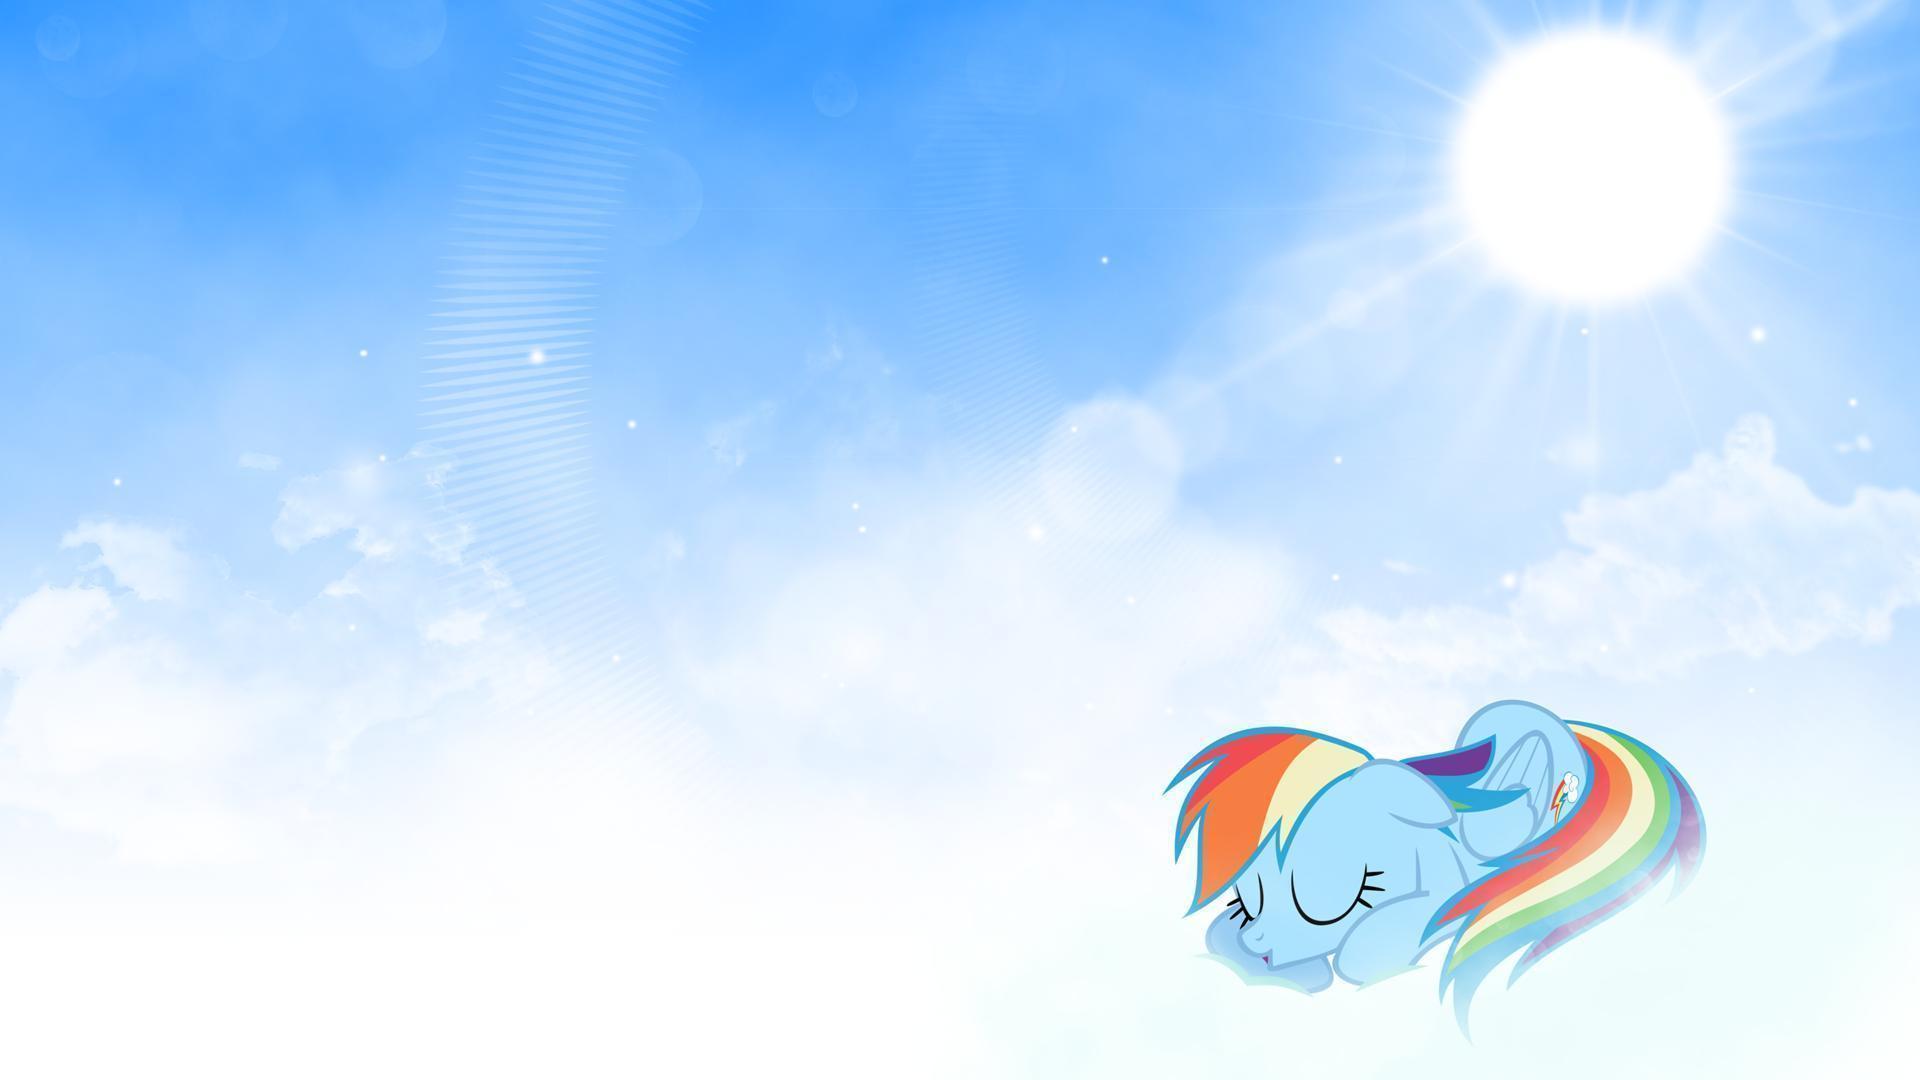 rainbow dash sphere background - photo #5